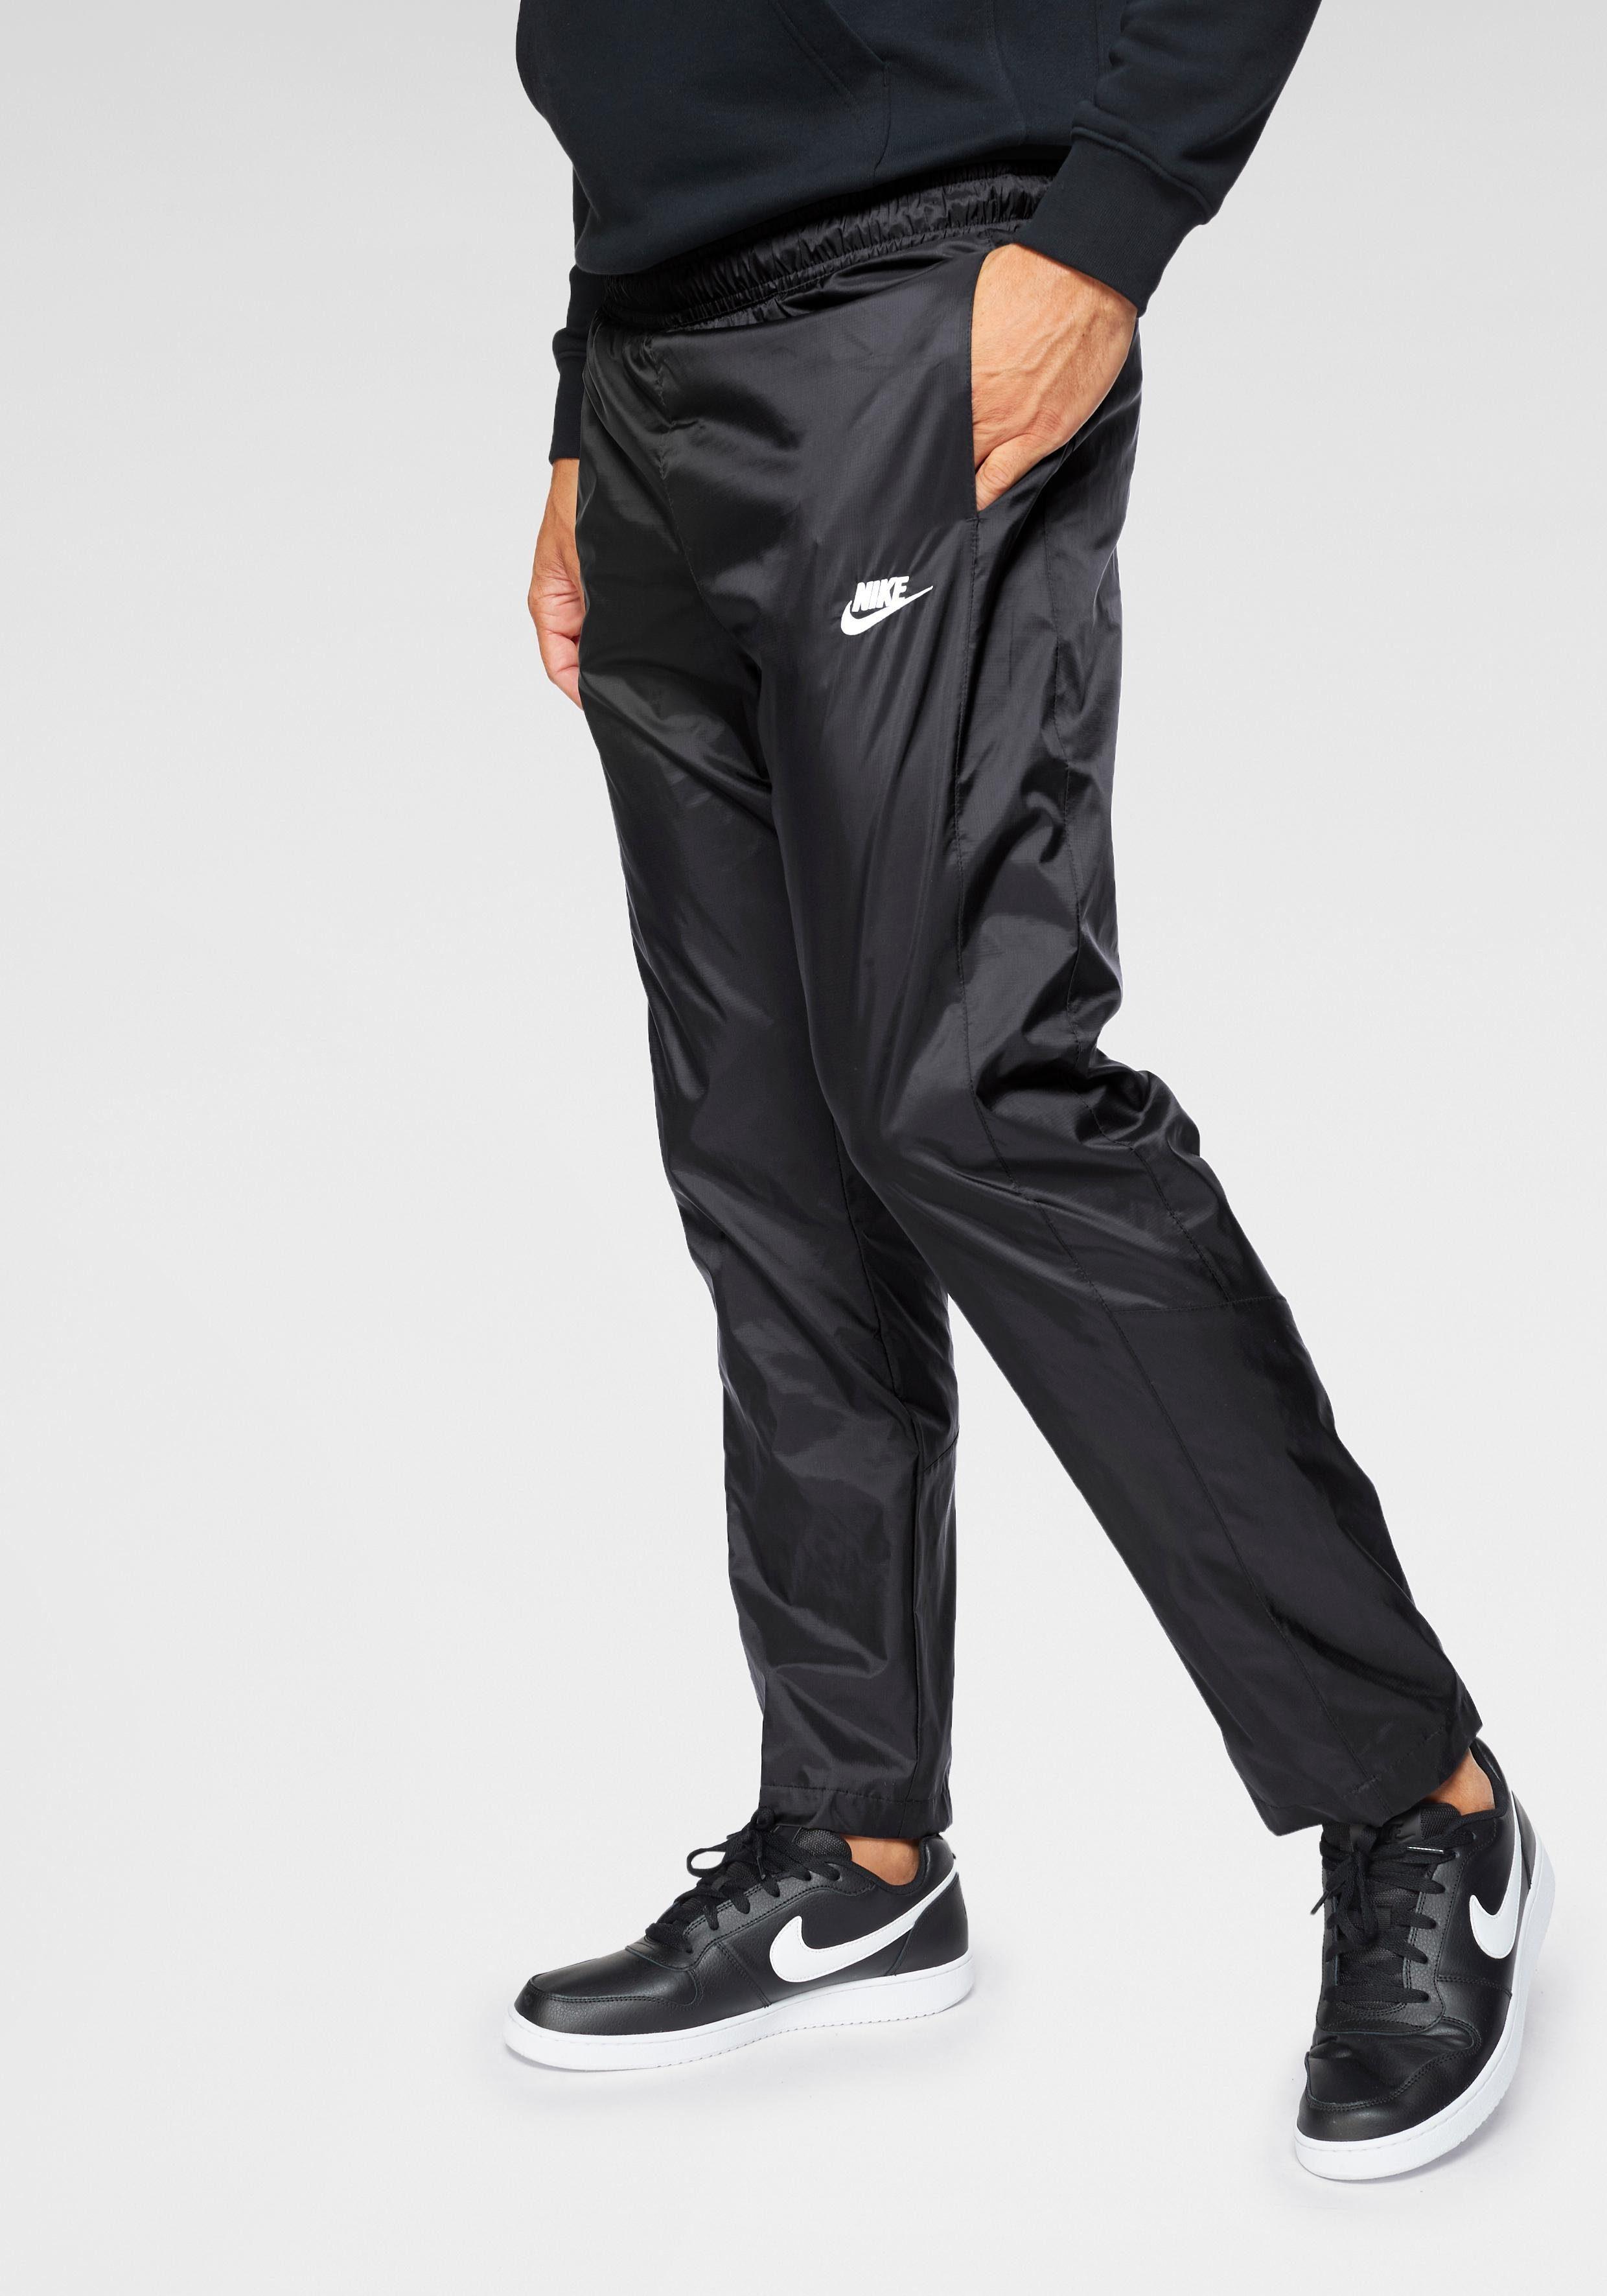 Nike Sportswear Sporthose »M NSW PANT OH WVN CORE TRACK« online kaufen | OTTO